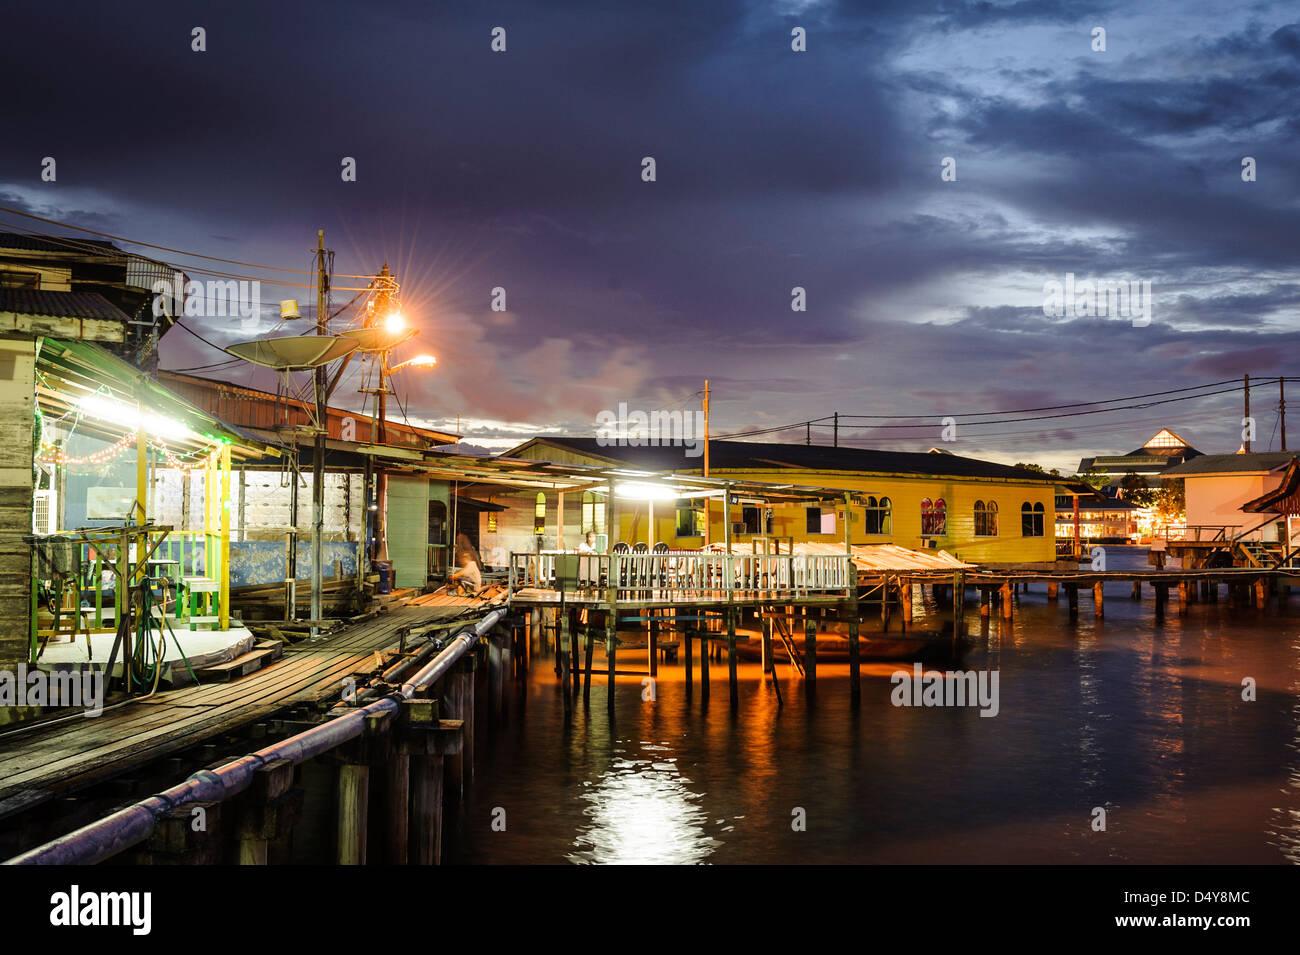 Stilt houses of the Kampung Ayer neighbourhood, Bandar Seri Bengawan, Brunei, Asia - Stock Image